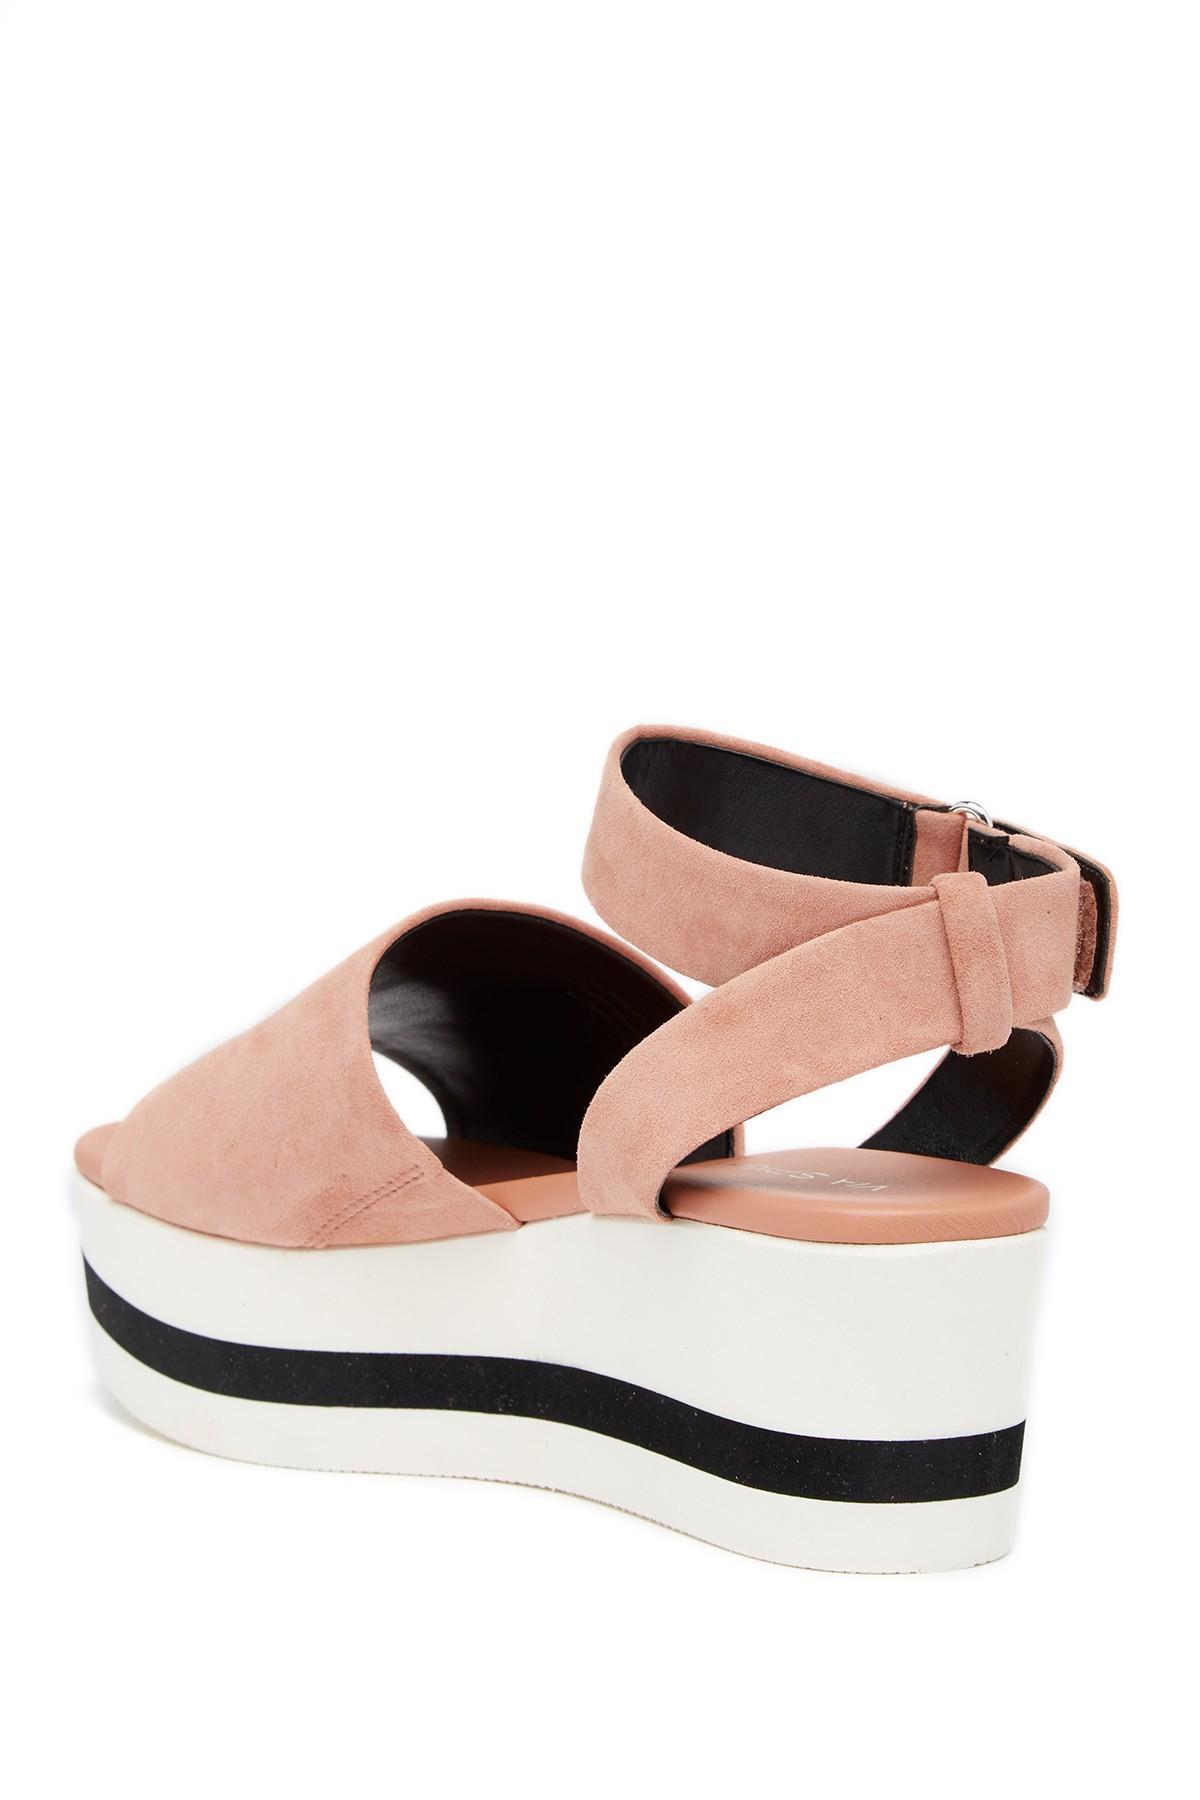 62584383e4d Lyst - Via Spiga Nirvelli Ankle Strap Platform Sandal